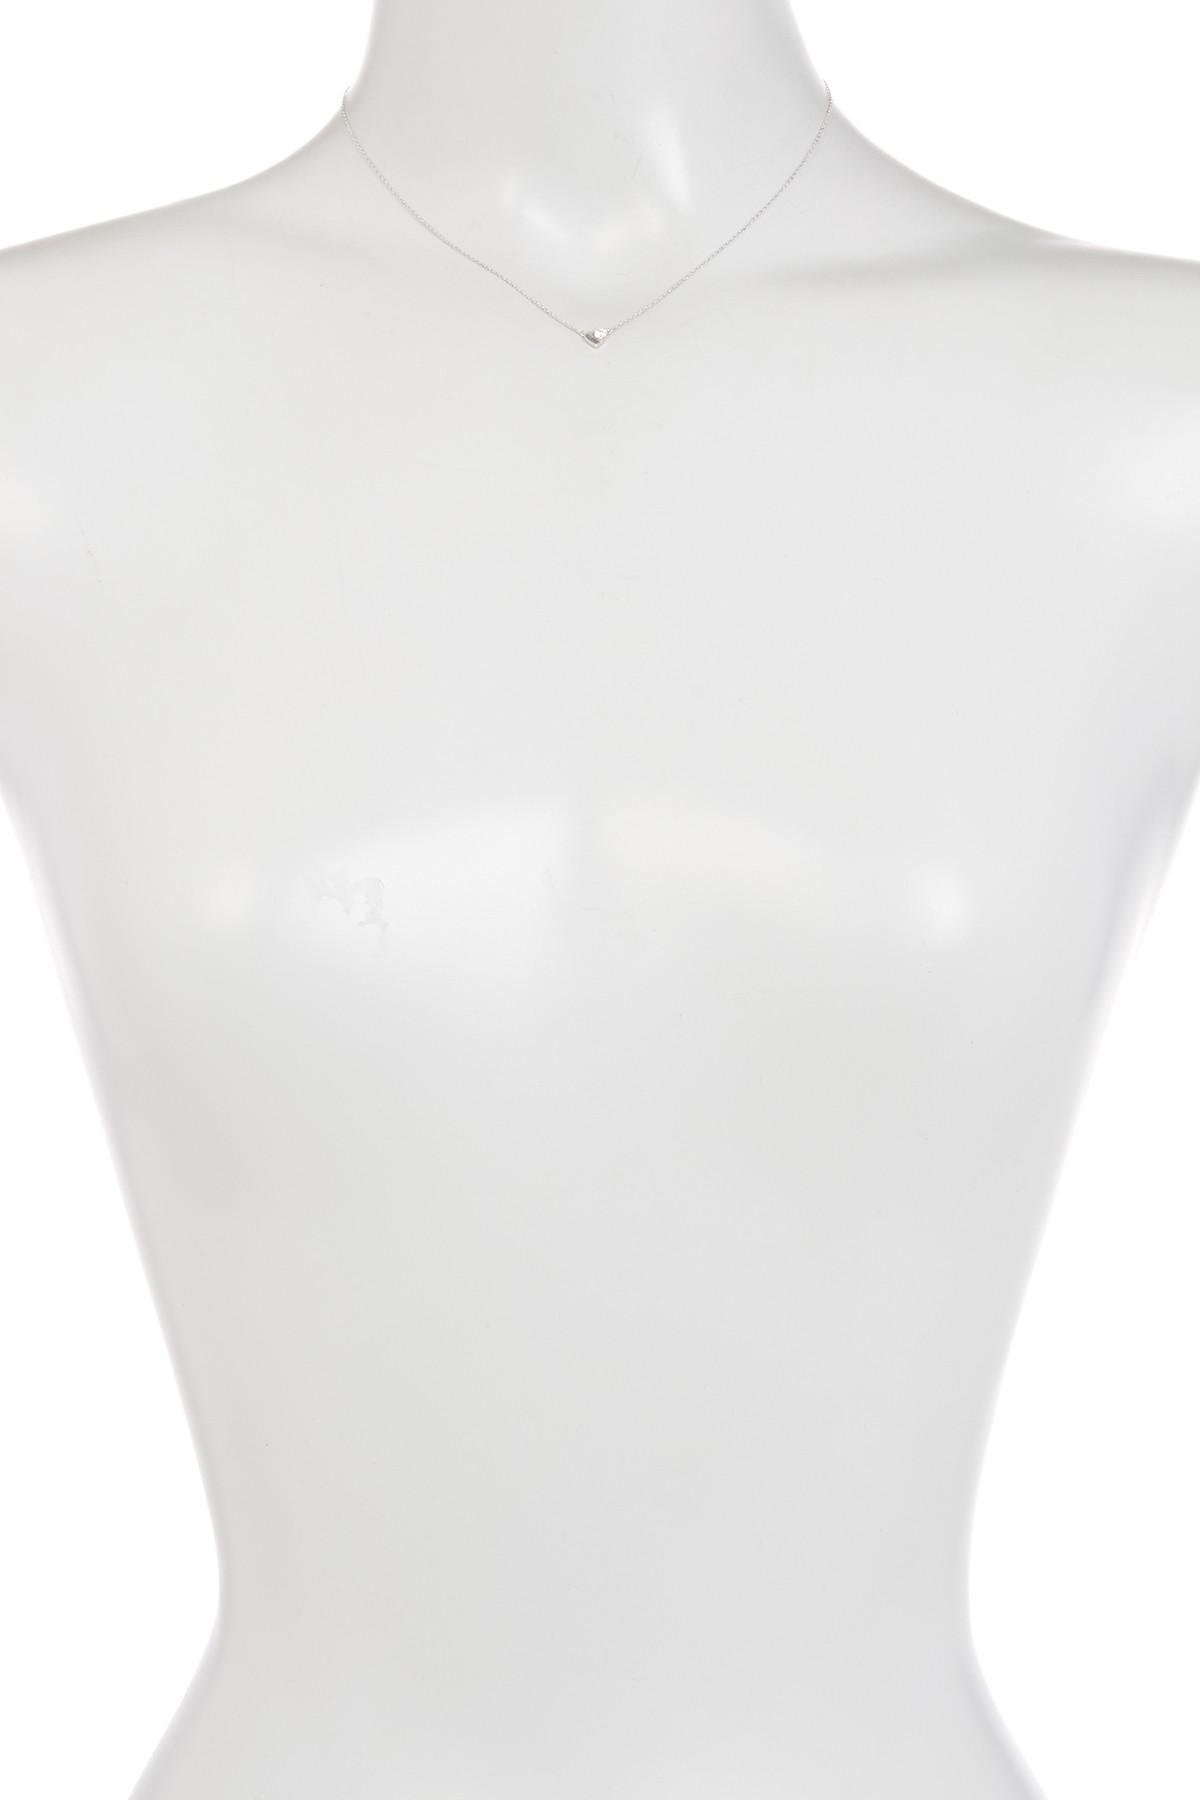 505b08885 Gucci 18k White Gold Trademark Diamond Heart Necklace - Lyst